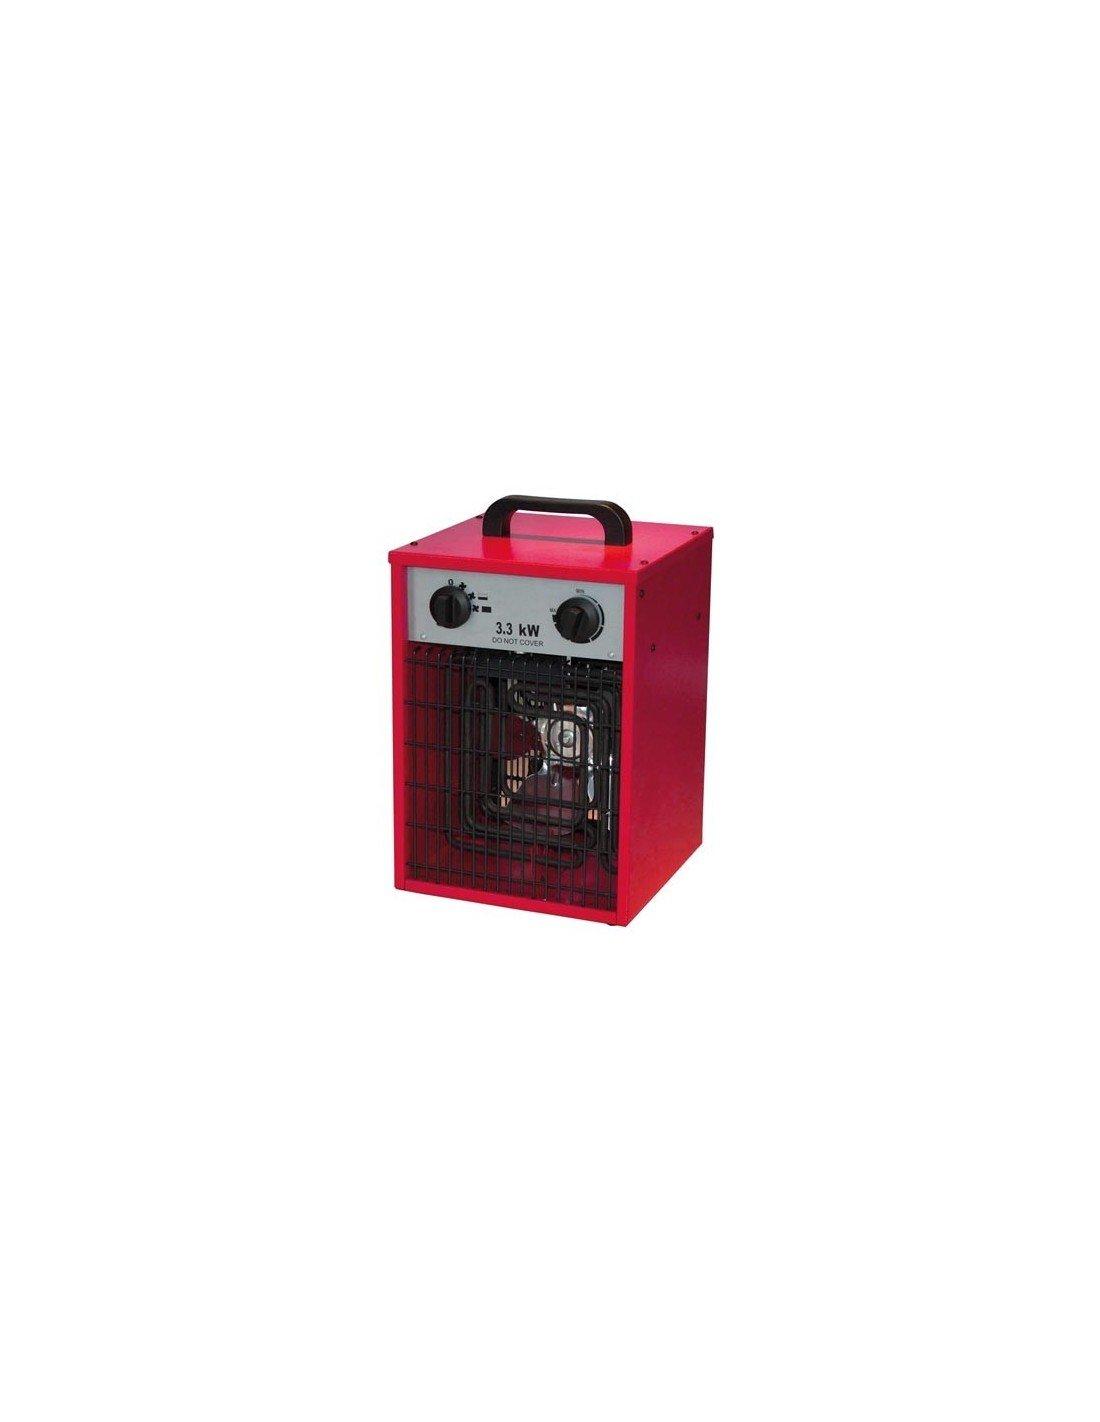 Tool País tc78070calefactor eléctrico calefactor Termoventilador Calefactor Diseño, IPX4, 3300W